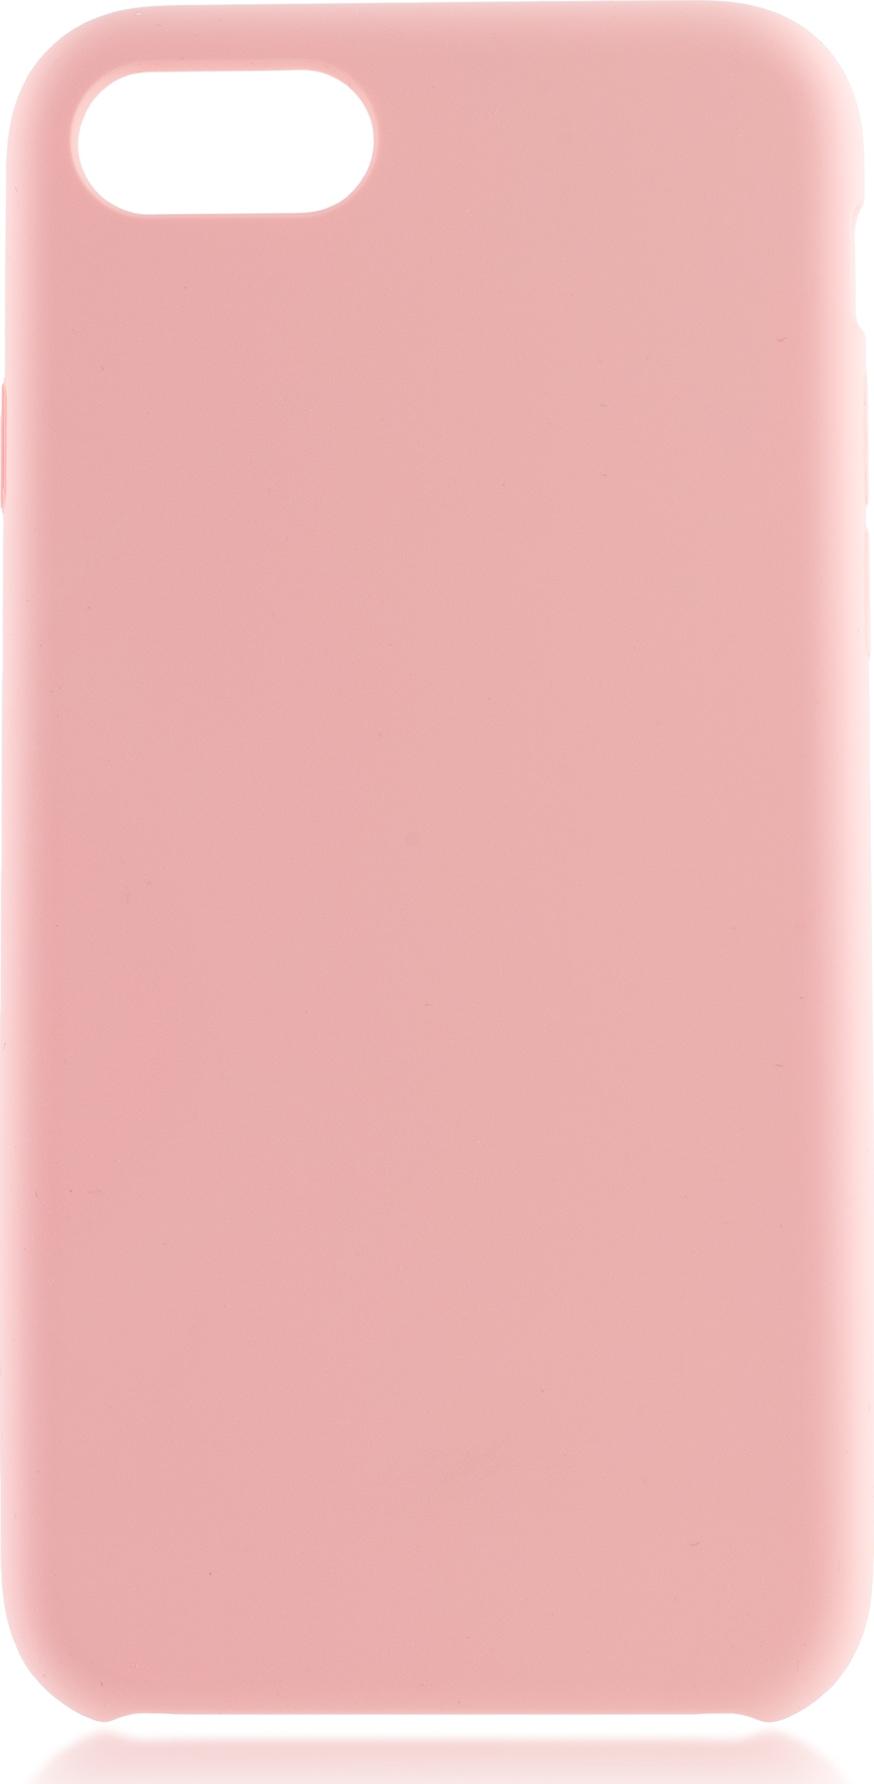 Чехол Brosco Softrubber для Apple iPhone 7, розовый цена и фото